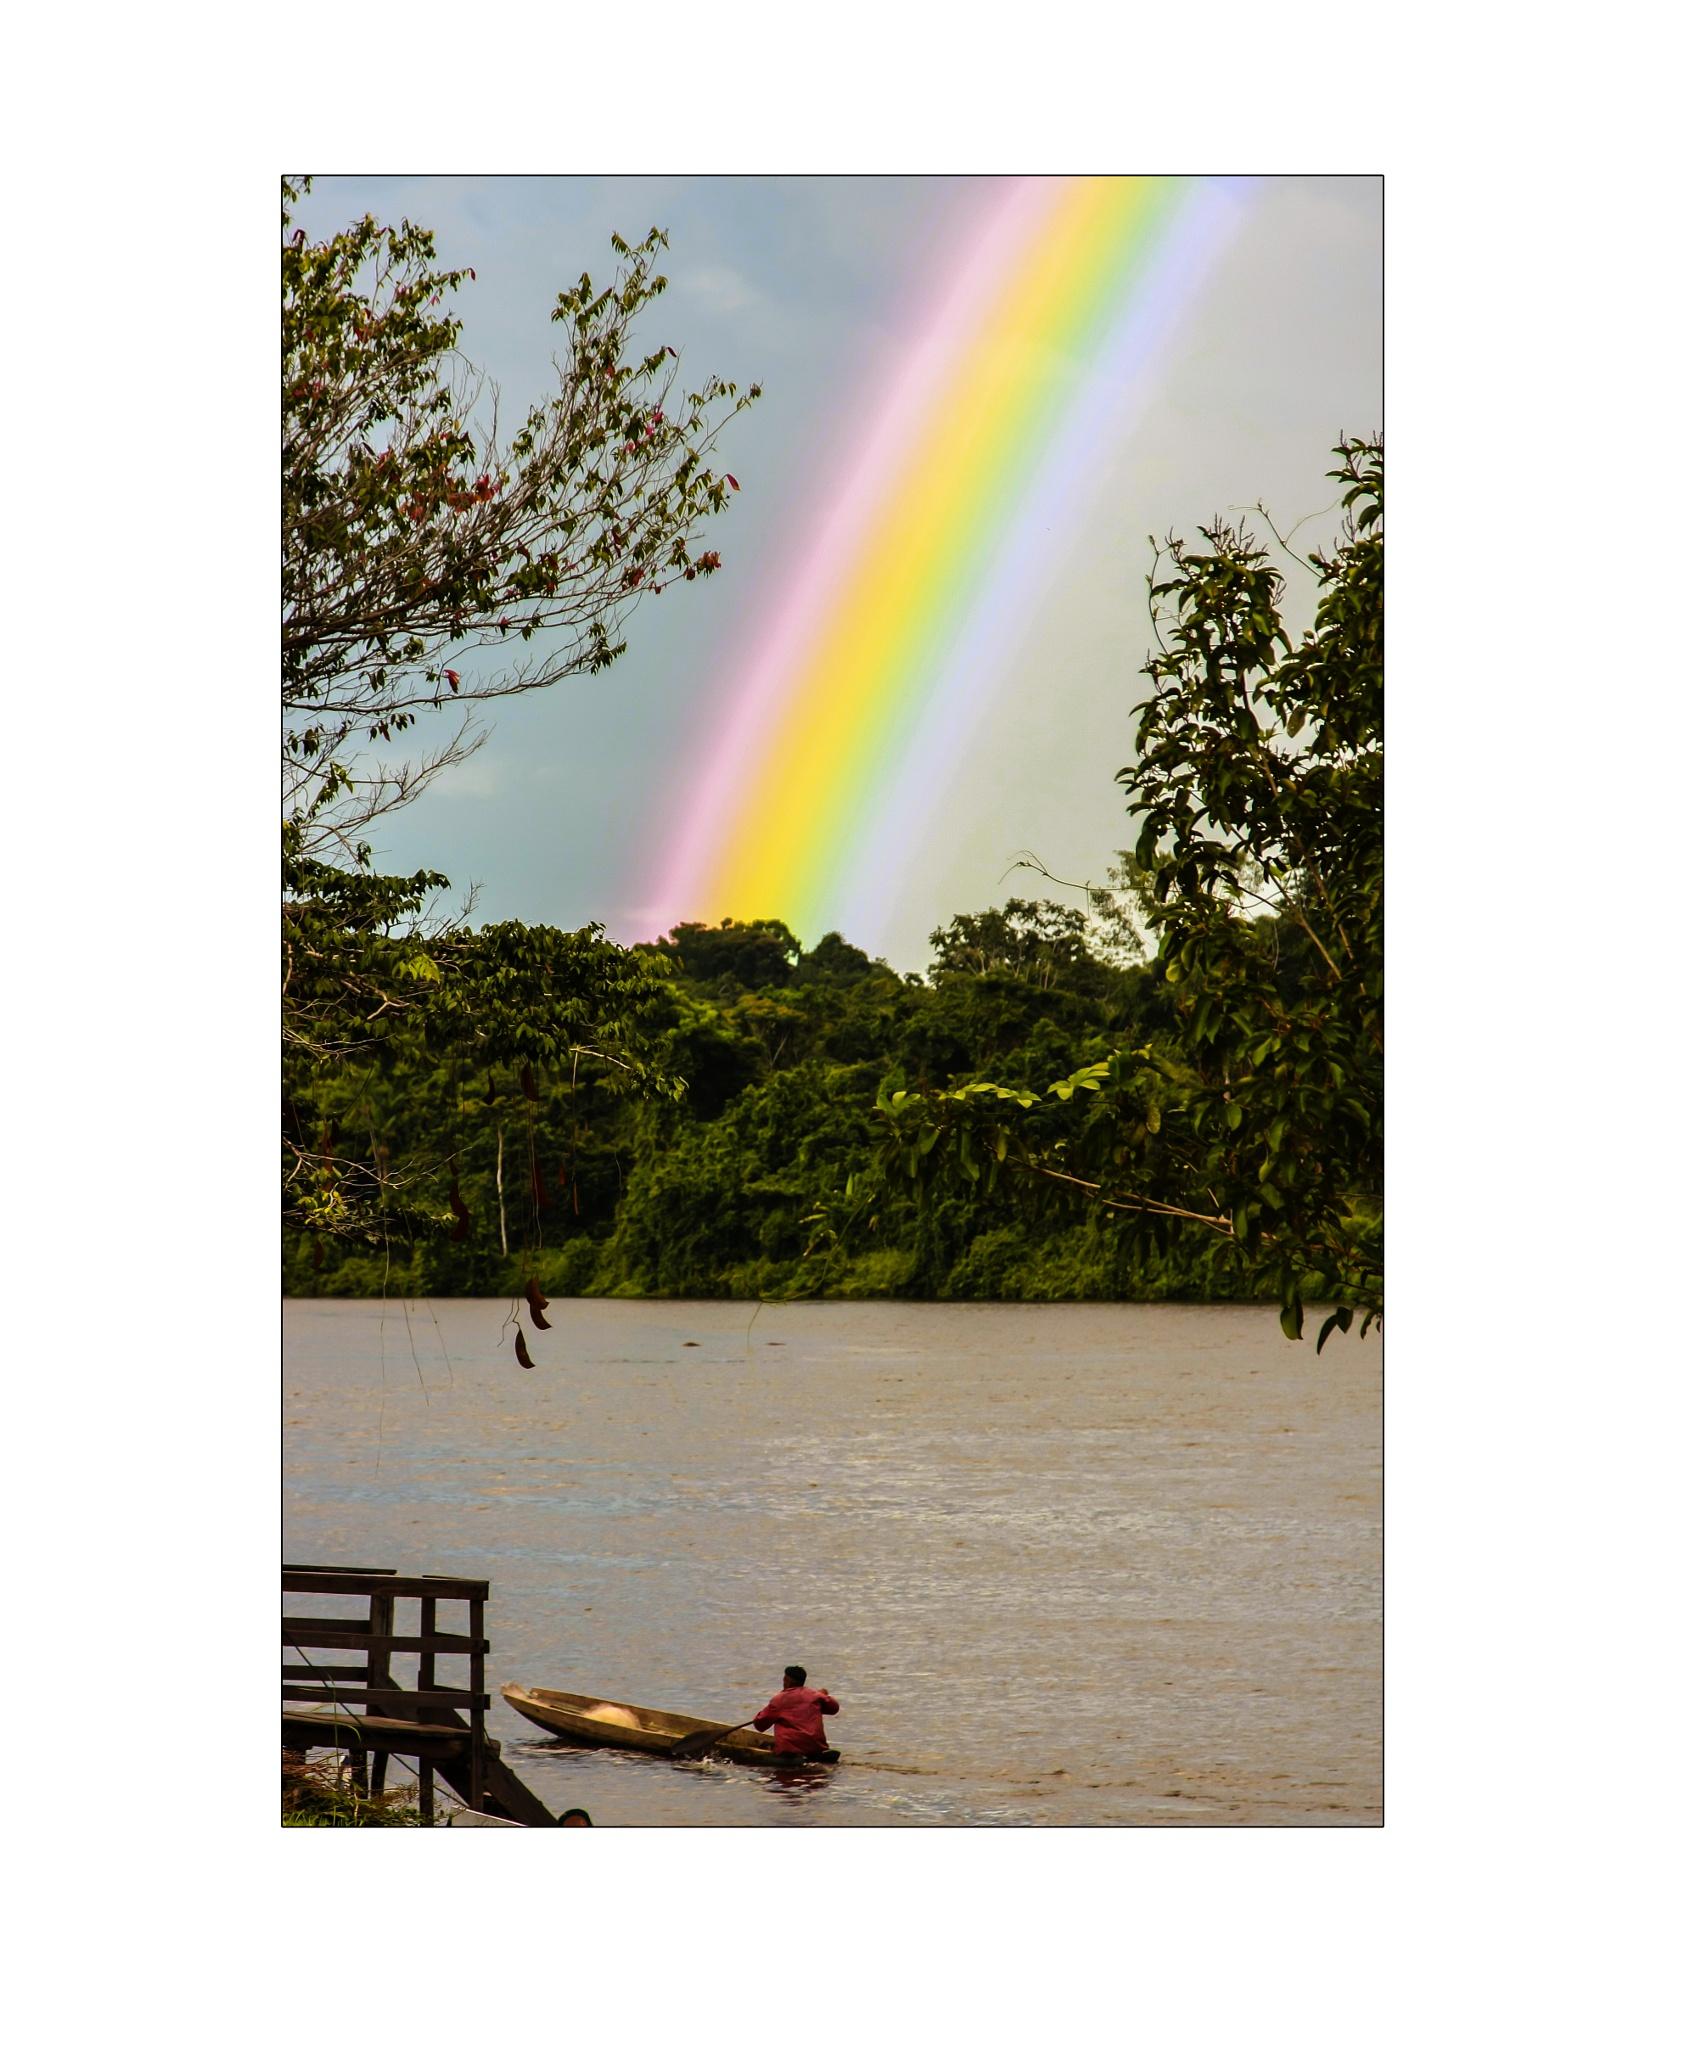 Rainforrest rainbow by ad.kesteloo